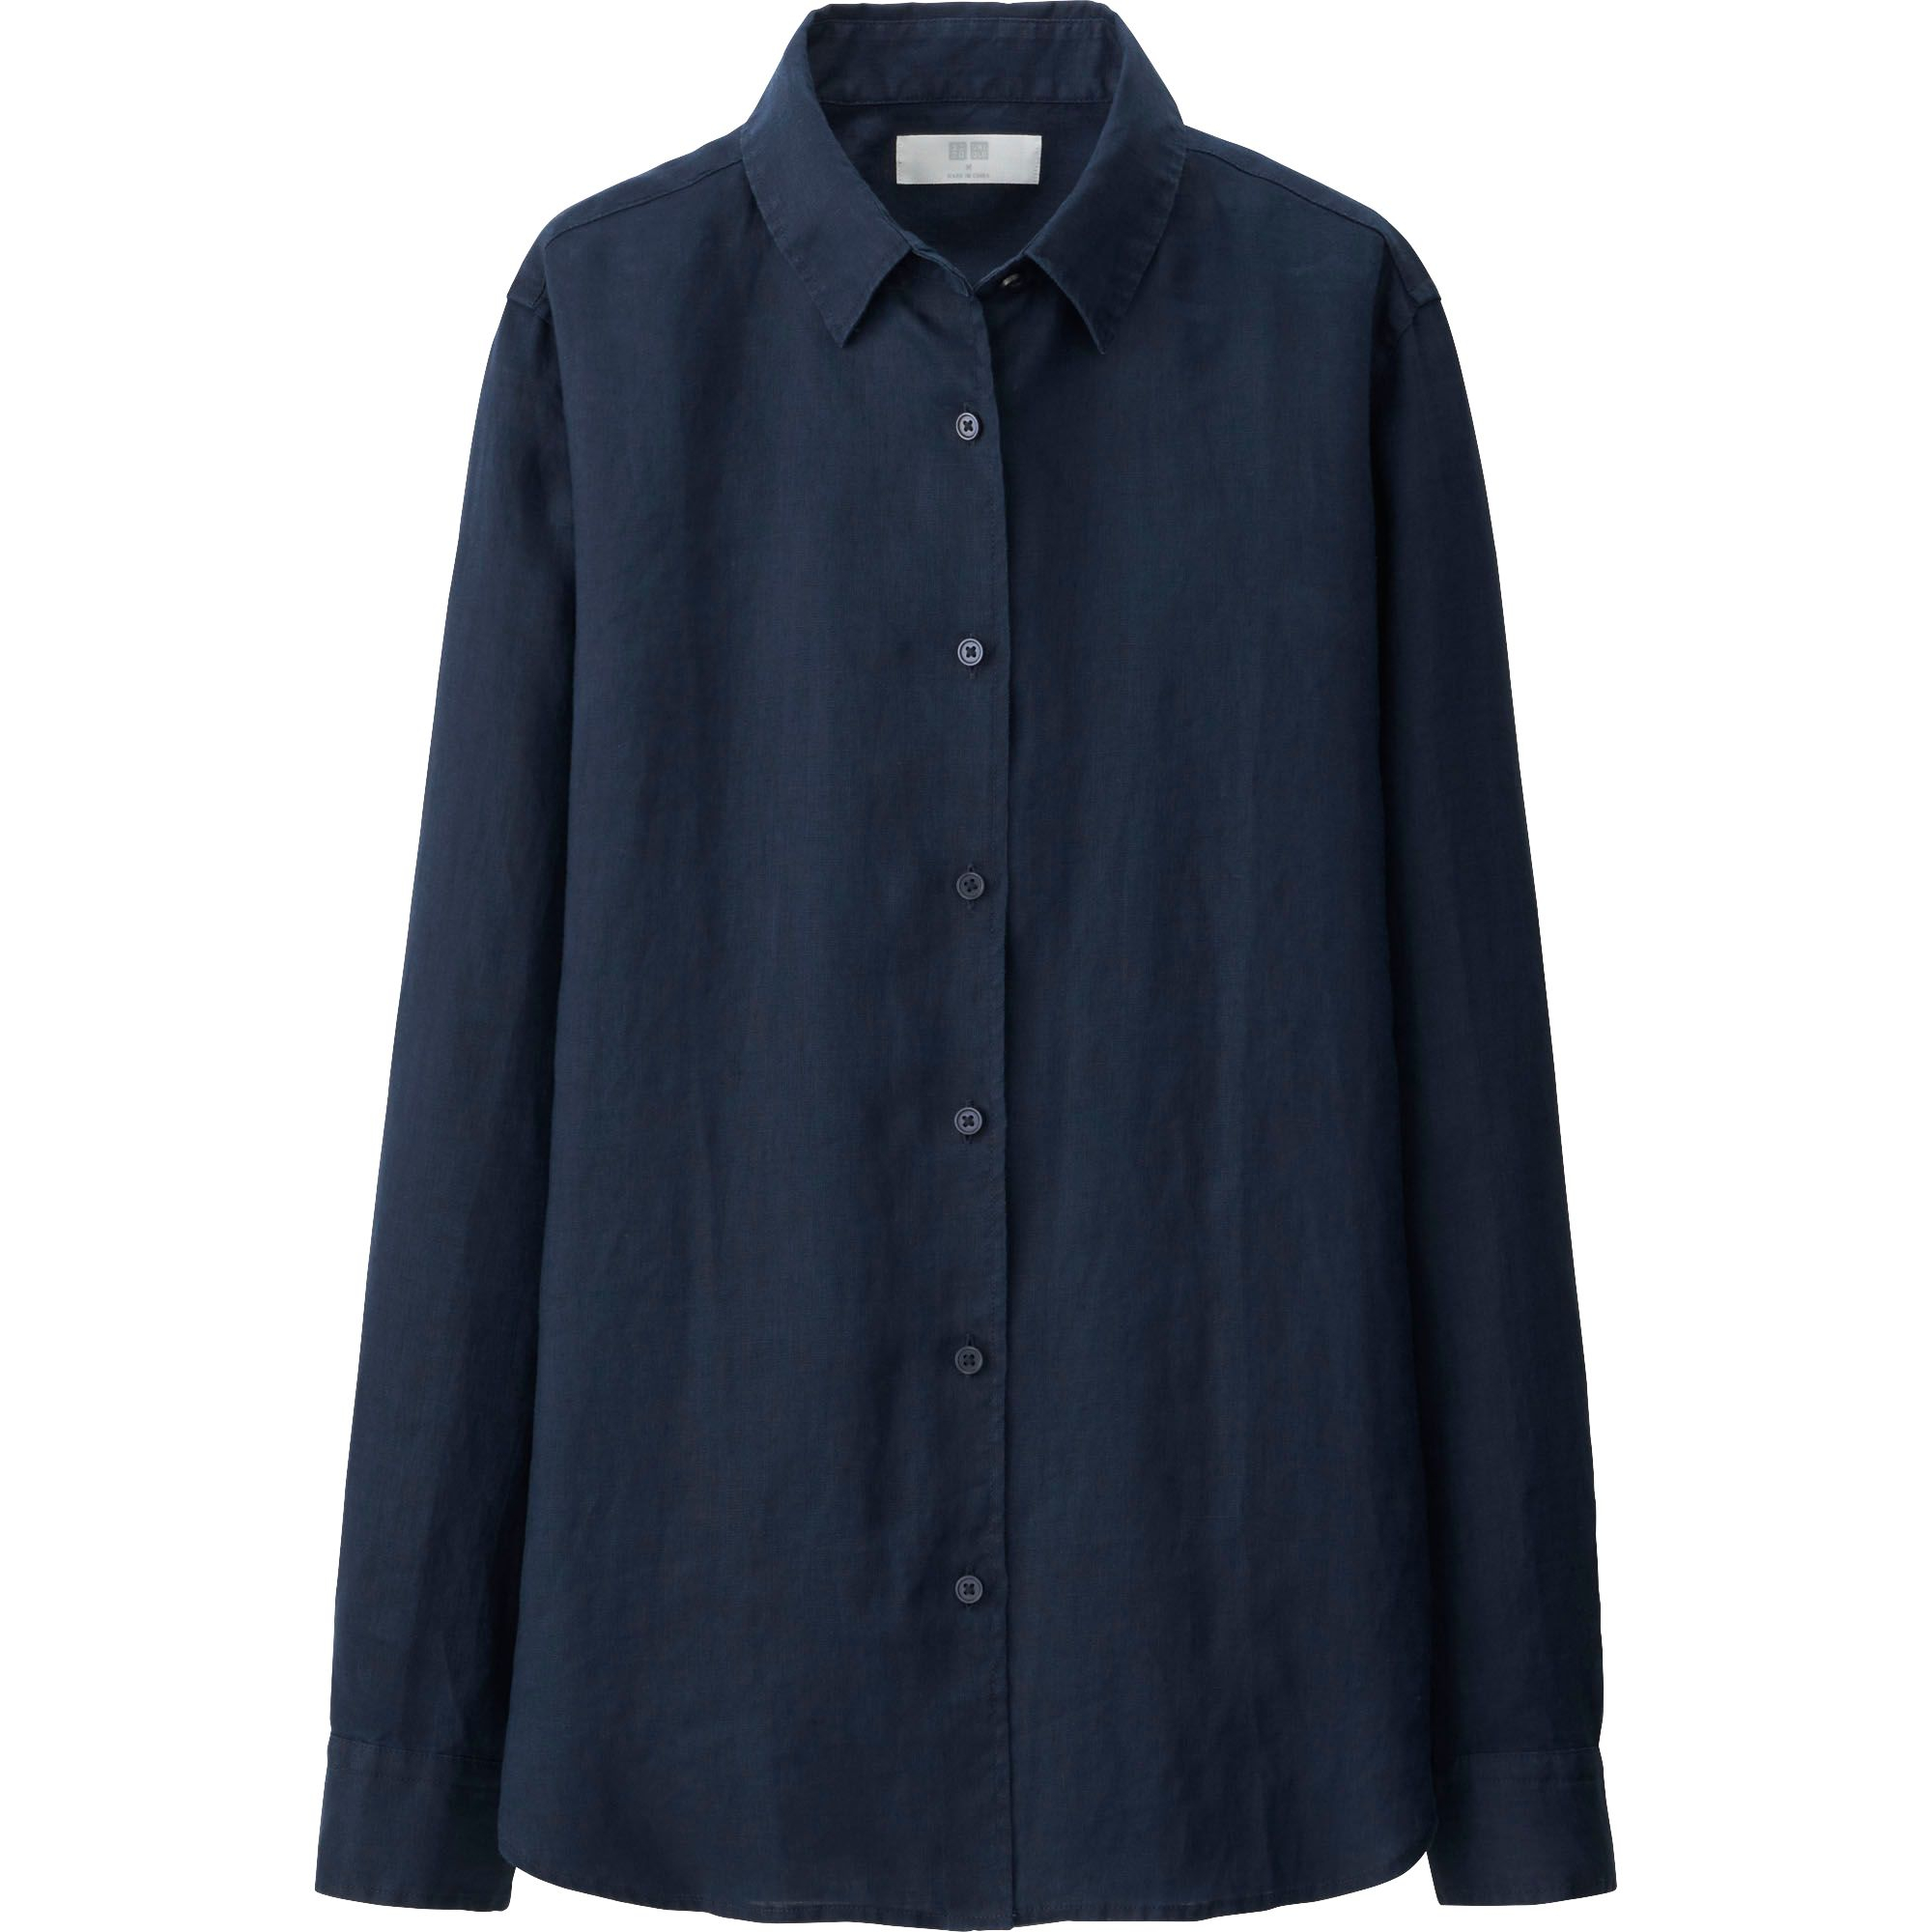 Uniqlo Women Premium Linen Long Sleeve Shirt In Blue Navy